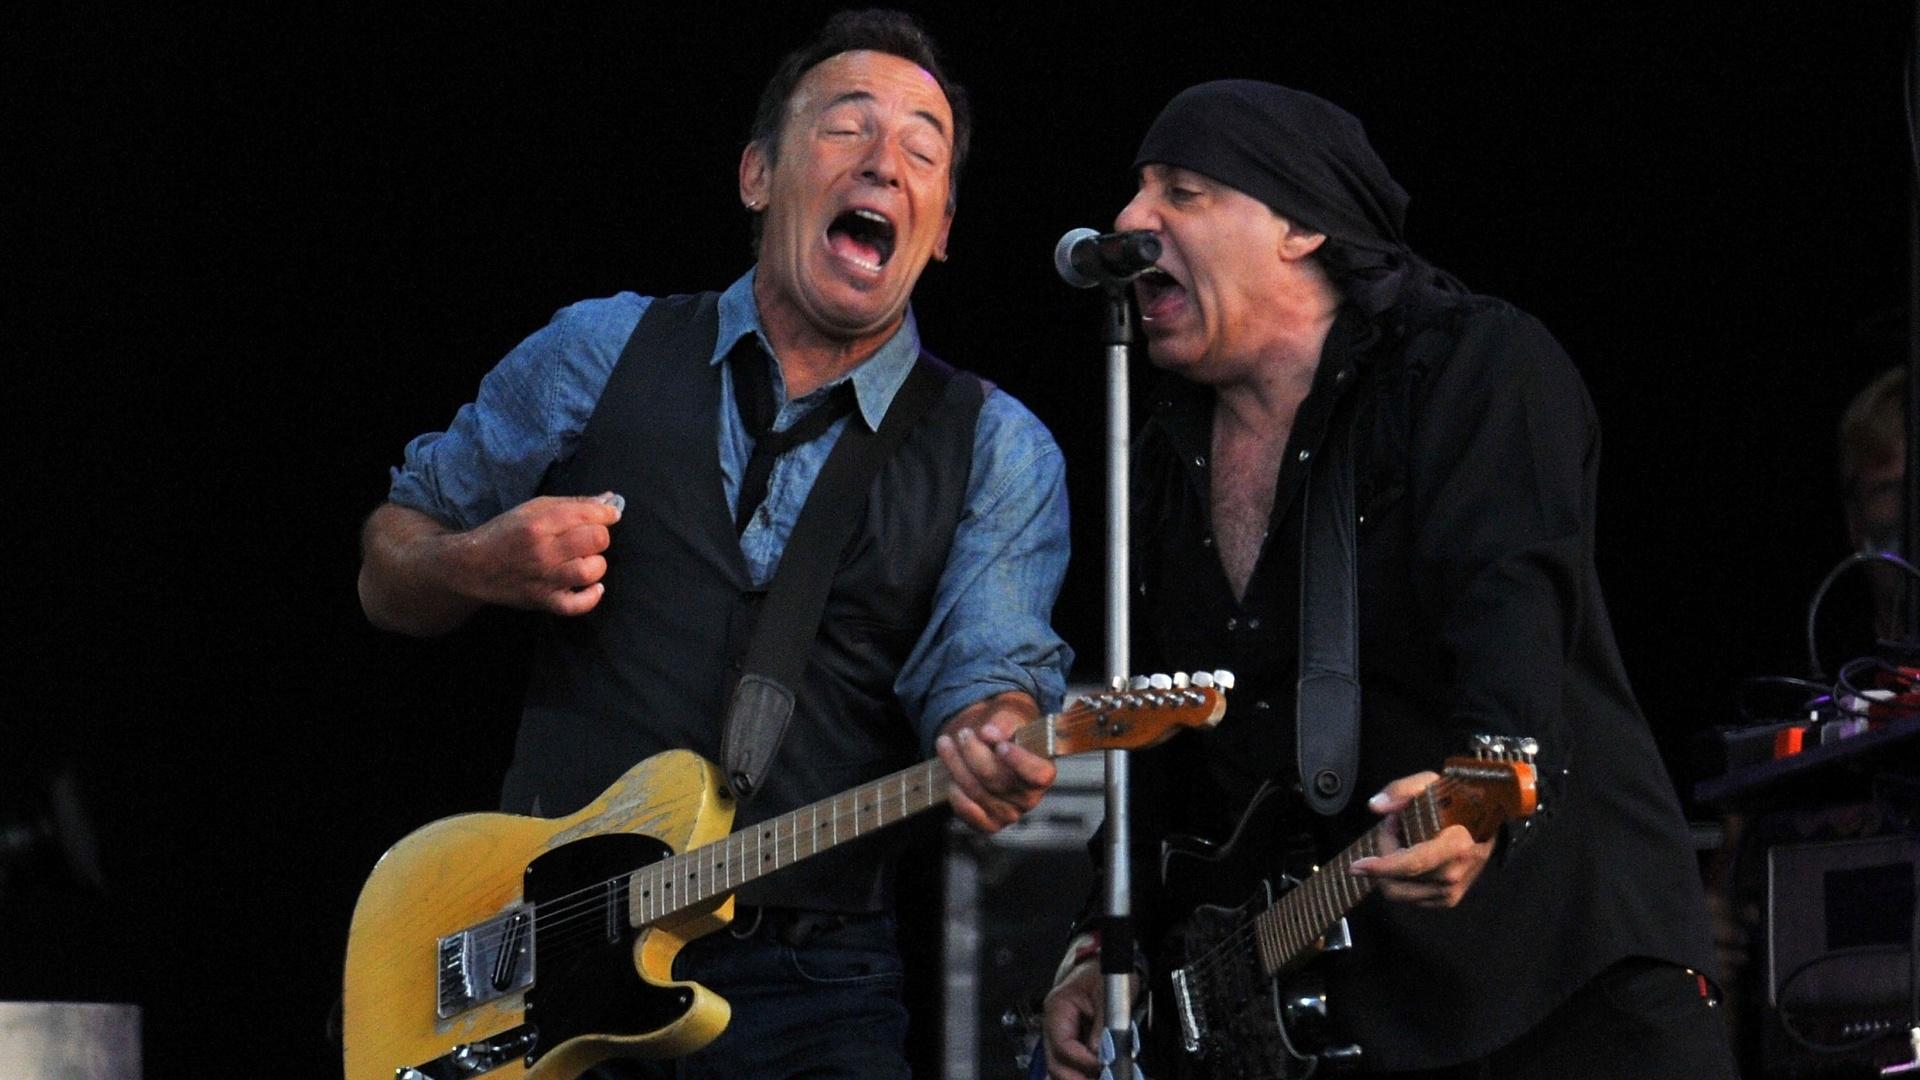 Bruce Springsteen toca e canta com Steven Van Zandt durante o segundo dia do Hard Rock Calling, no Hyde Park, em Londres, na Inglaterra (14/07/2012)